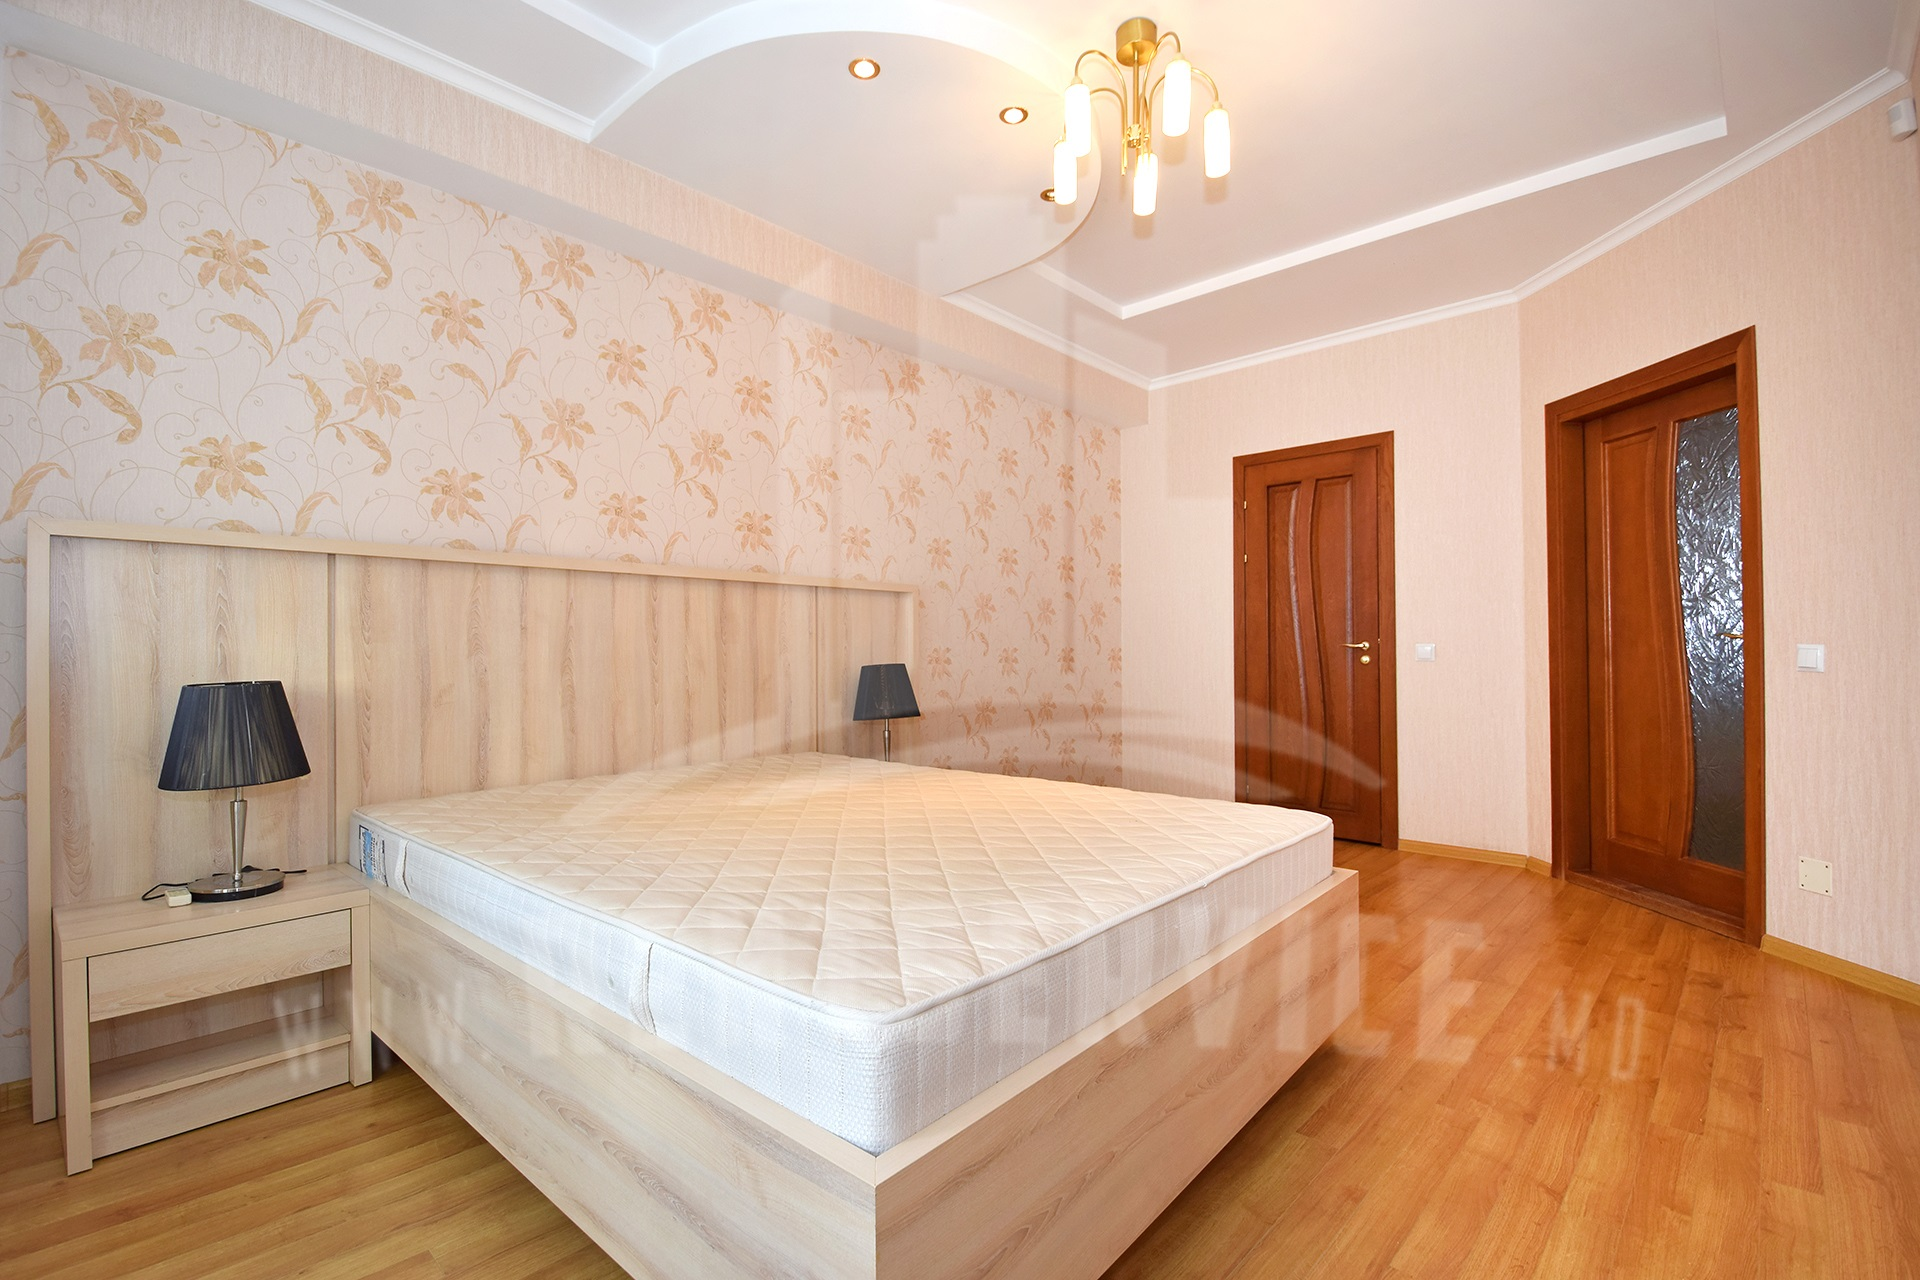 211_apartment_9.JPG